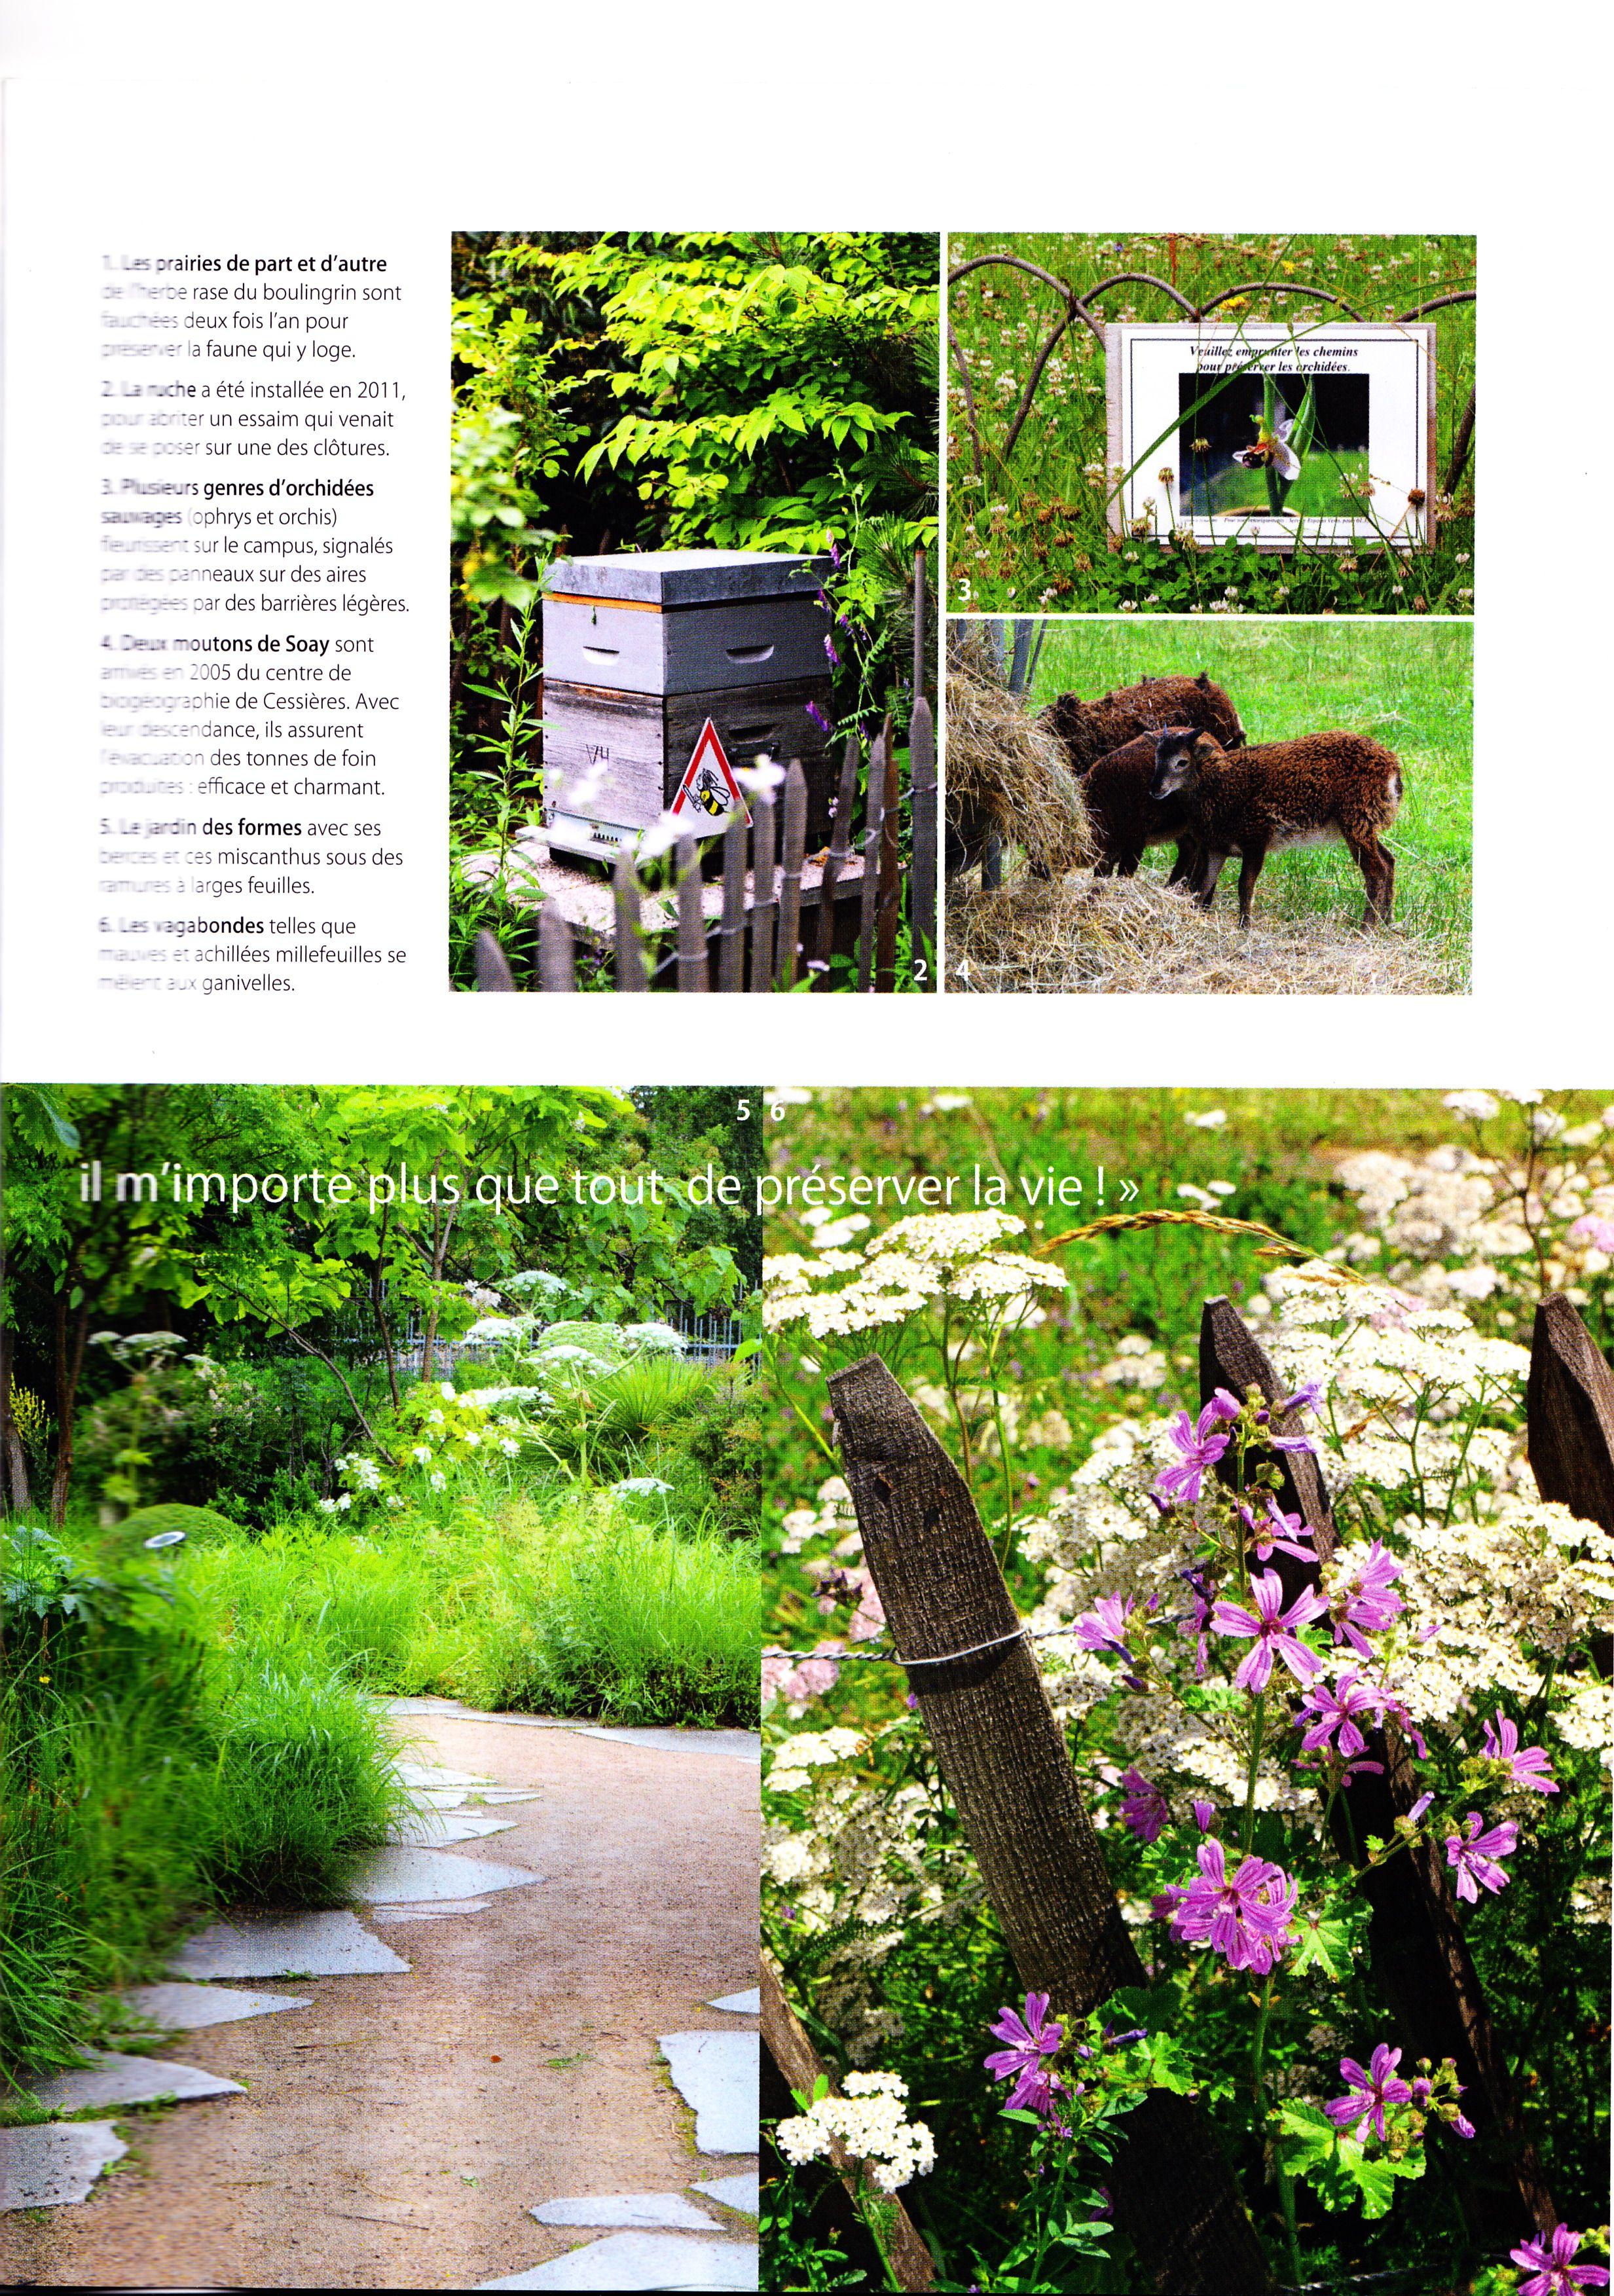 Mon Jardin En Avril le juste jardin, mon jardin ma maison, avril 2013 (page 4